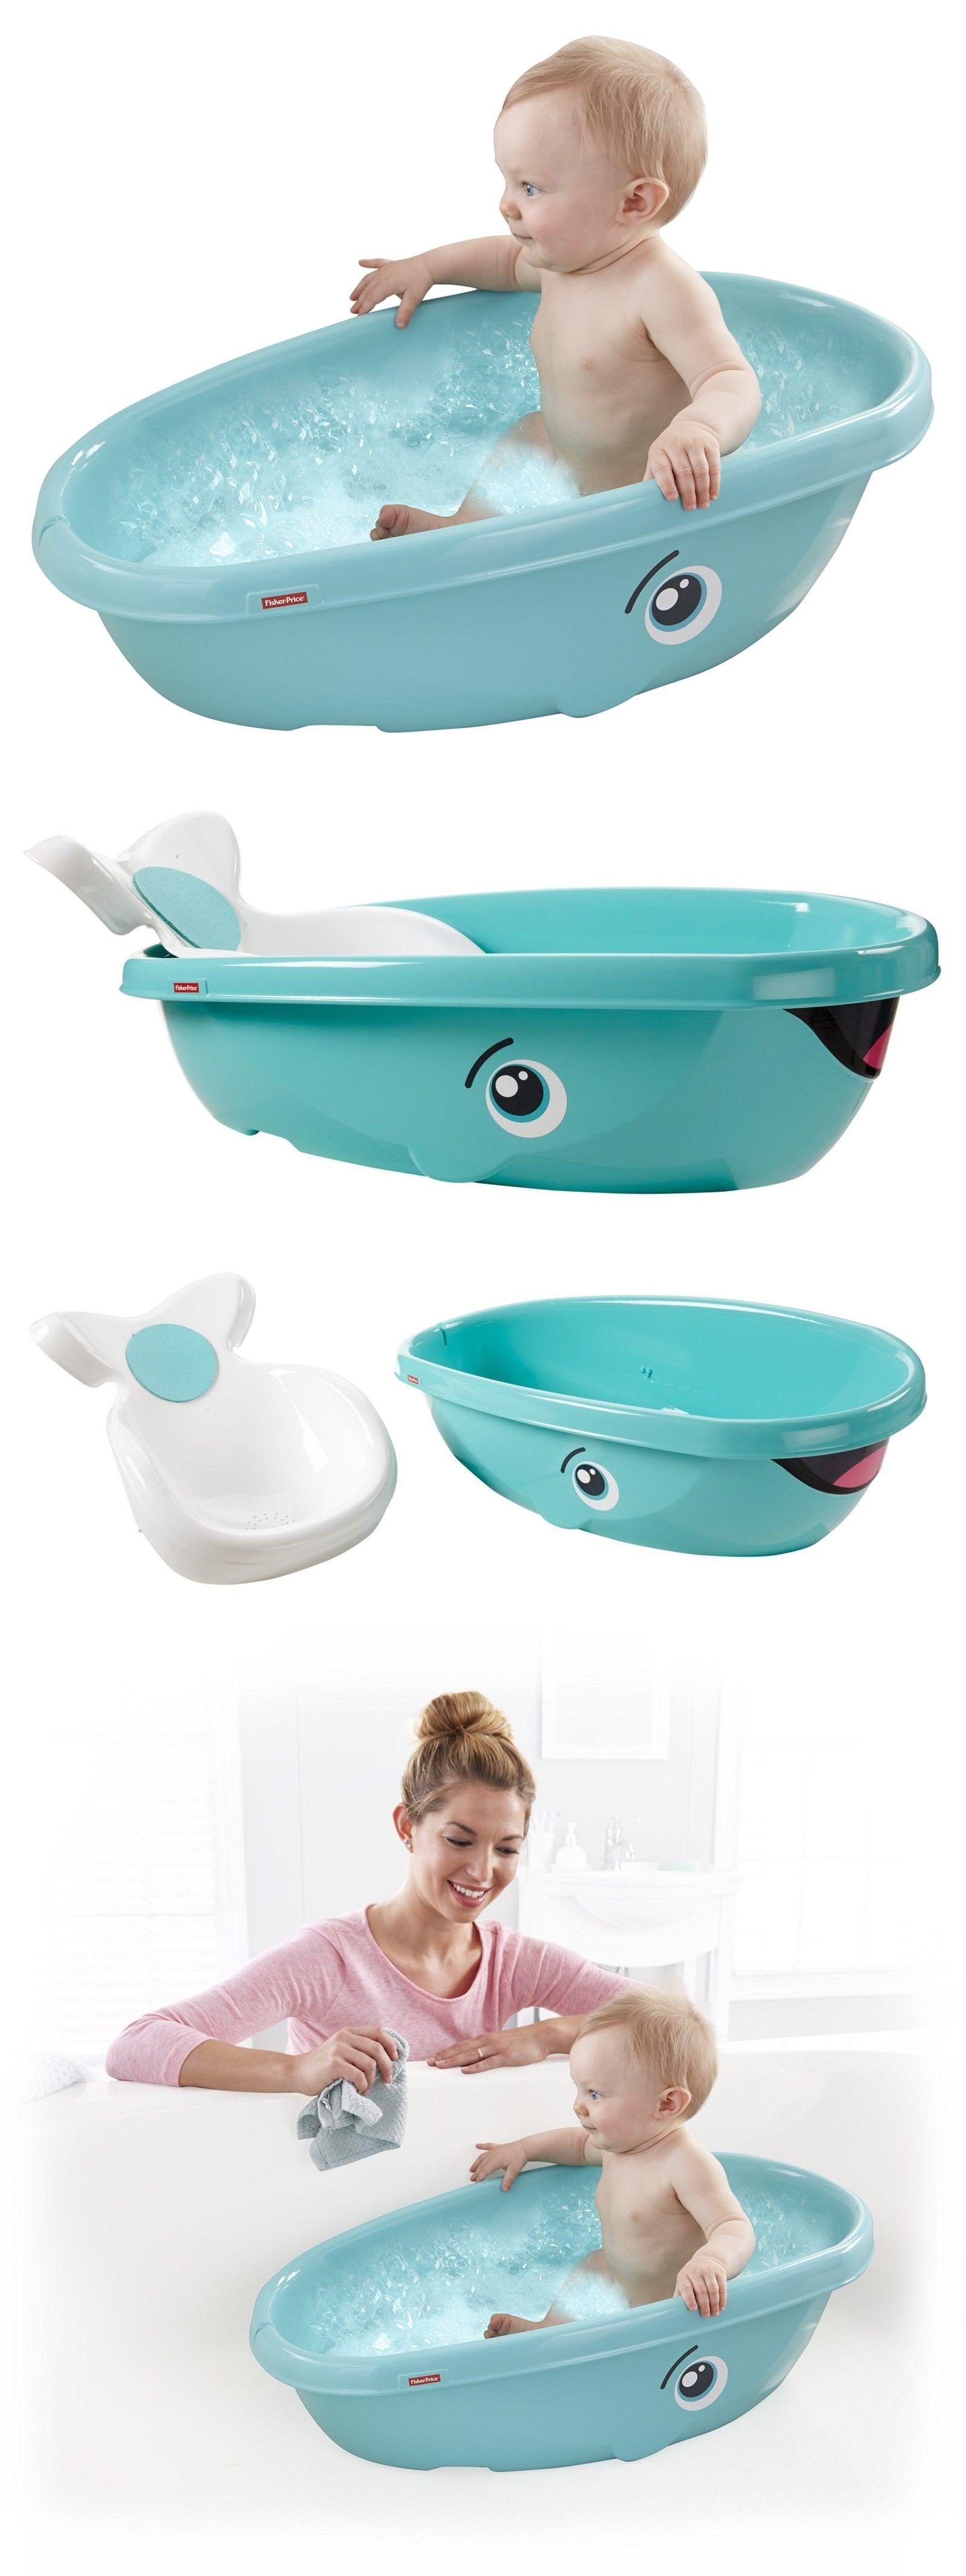 Bath Tubs 113814: Fisher Price Whale Baby Bathtub Kids Toddler ...